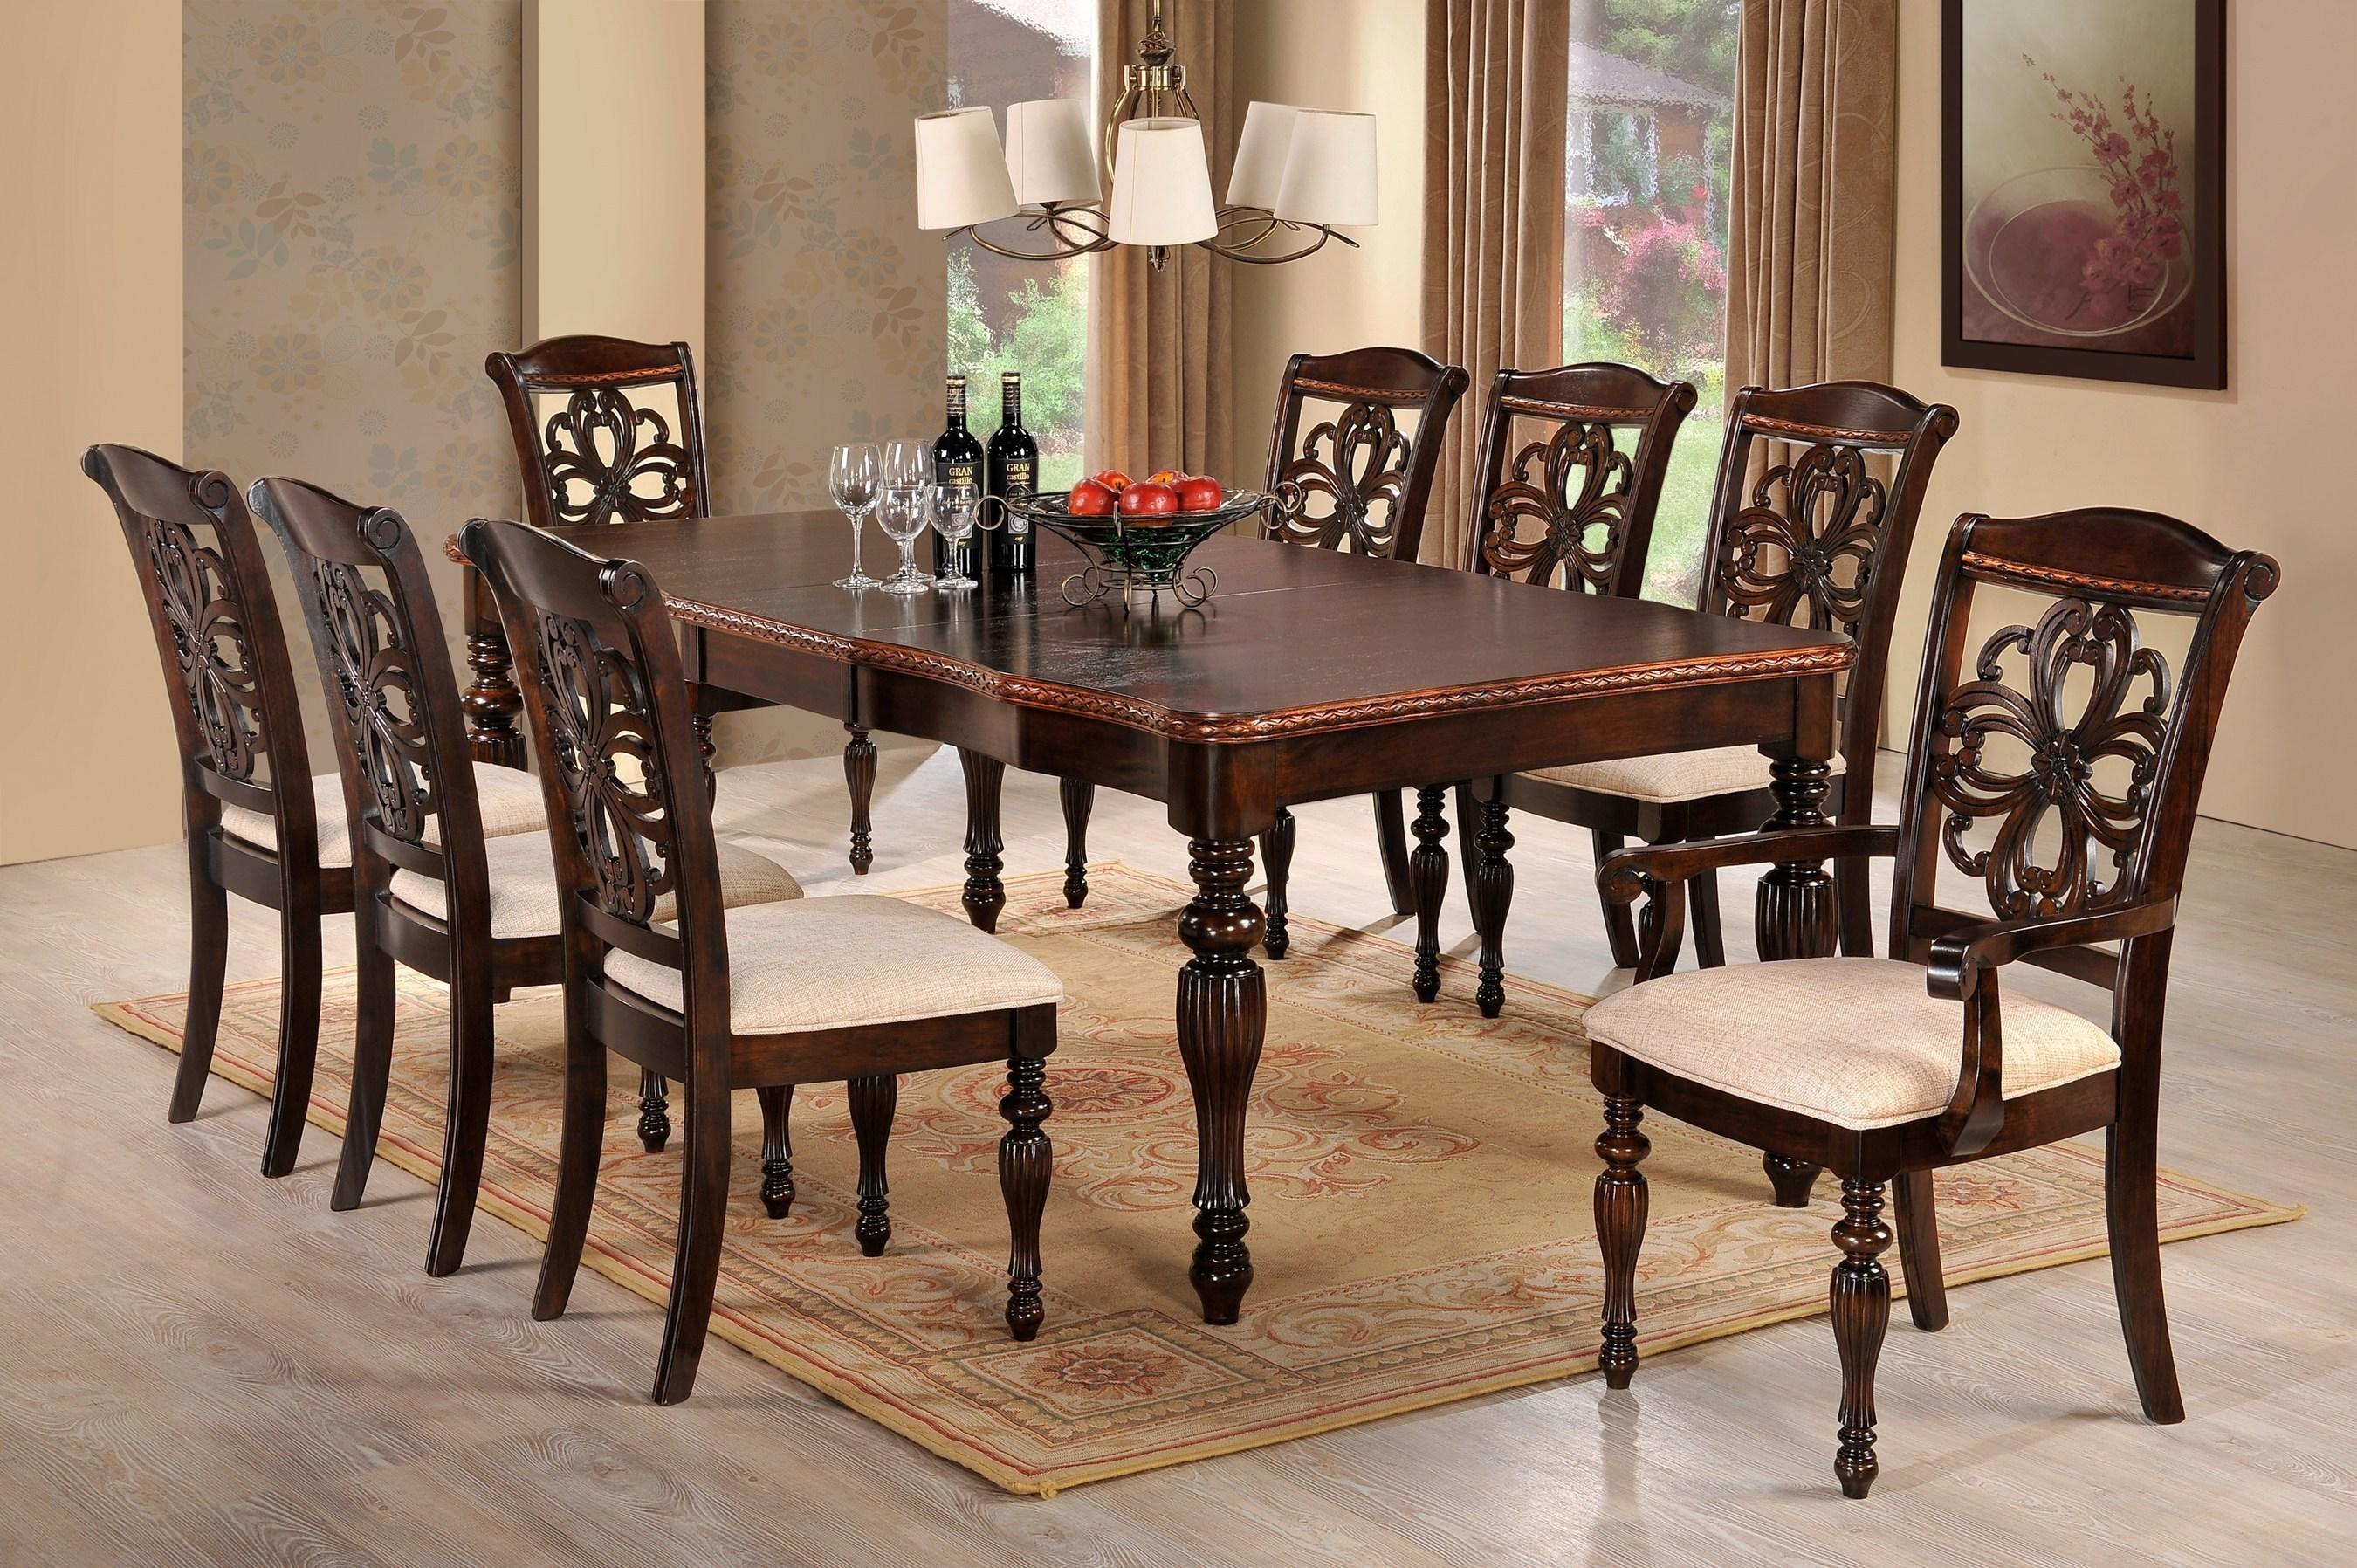 Malaysian international furniture fair sets trade